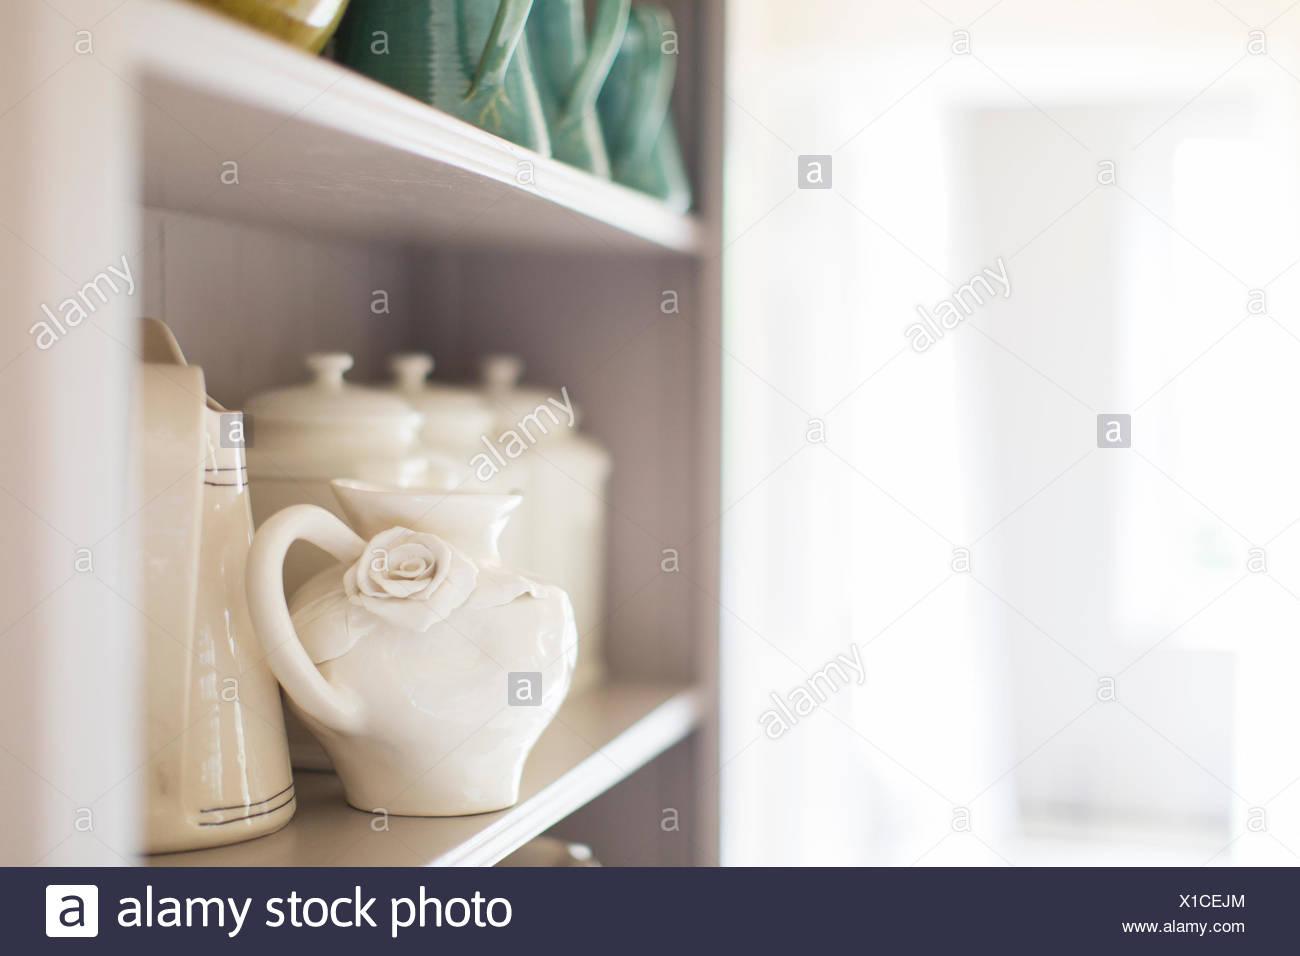 Close up of ceramics on kitchen shelf - Stock Image